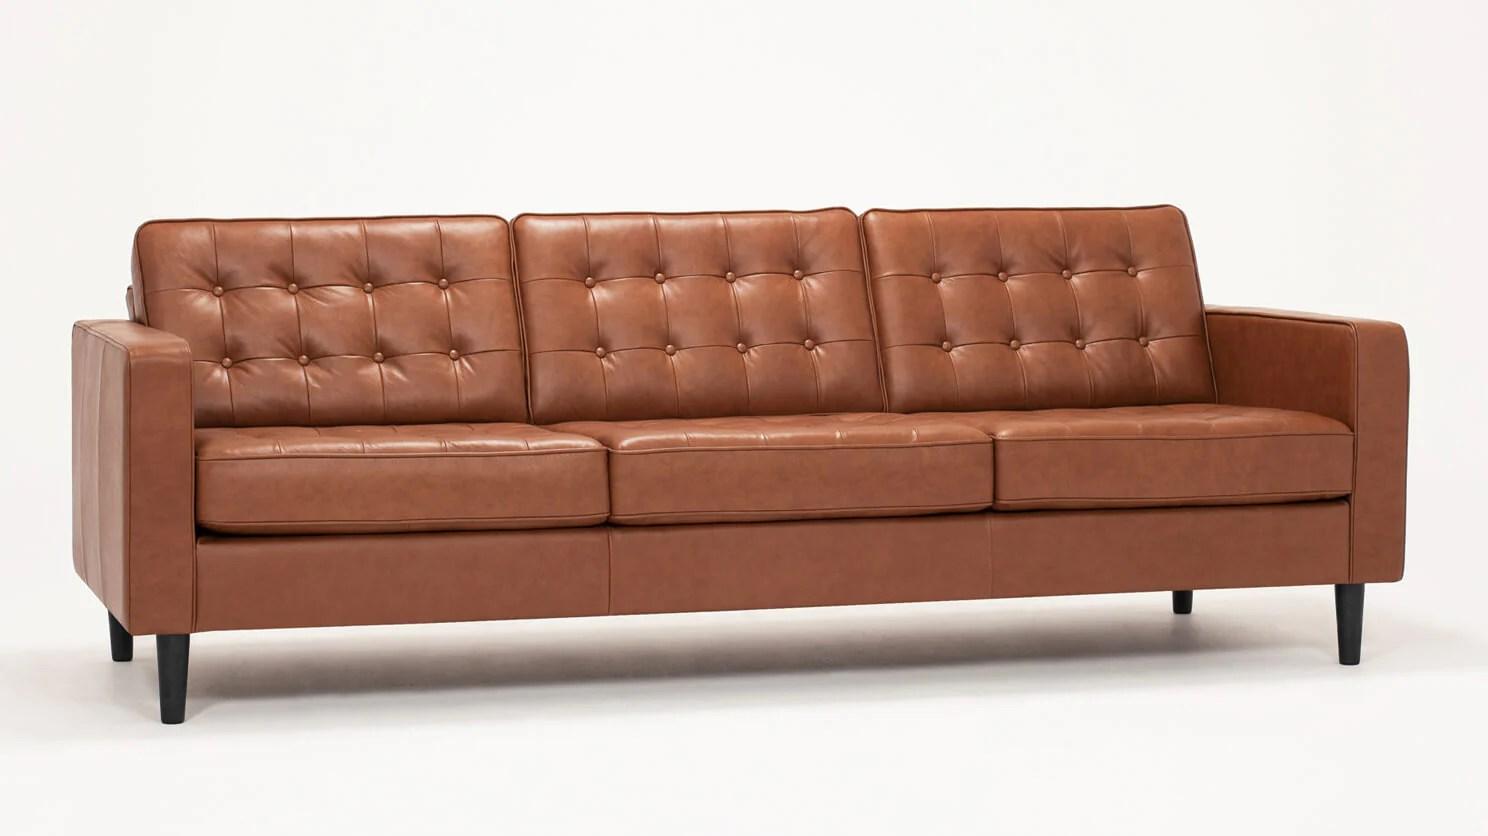 sofa classic fresno fc u23 sofascore reverie 92 urbane eq3